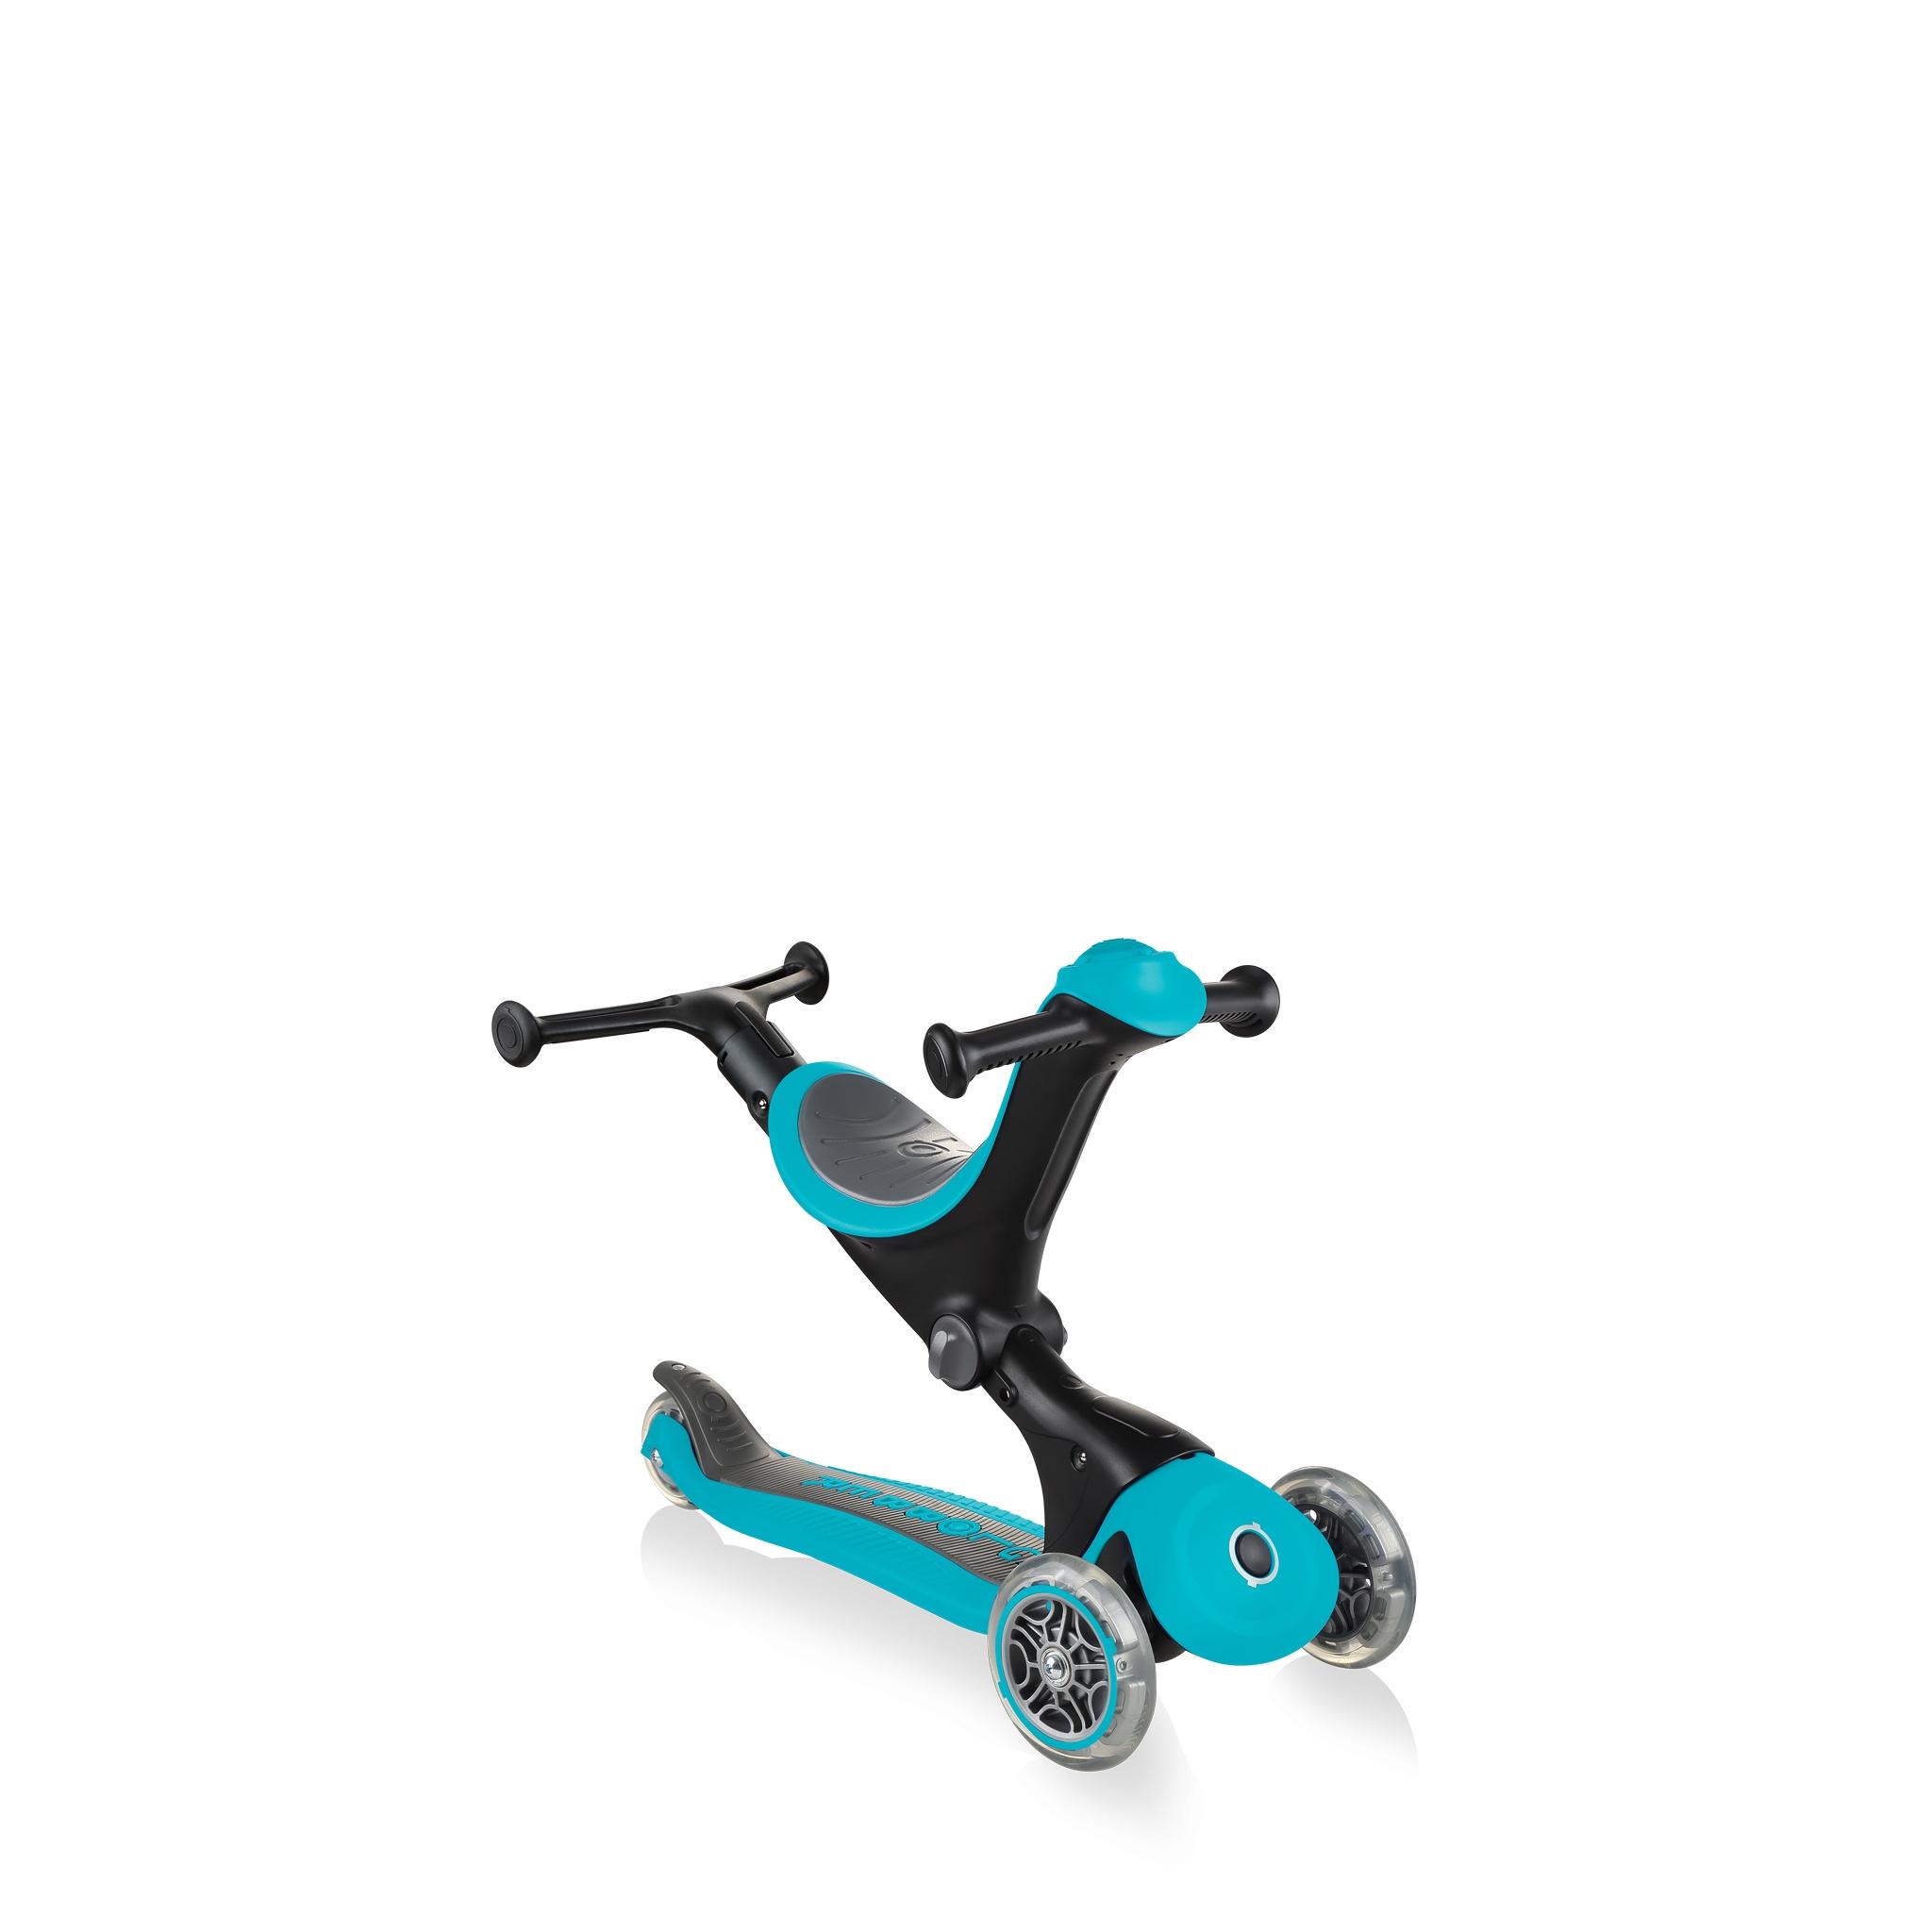 GO-UP-DELUXE-walking-bike-mode-teal 3